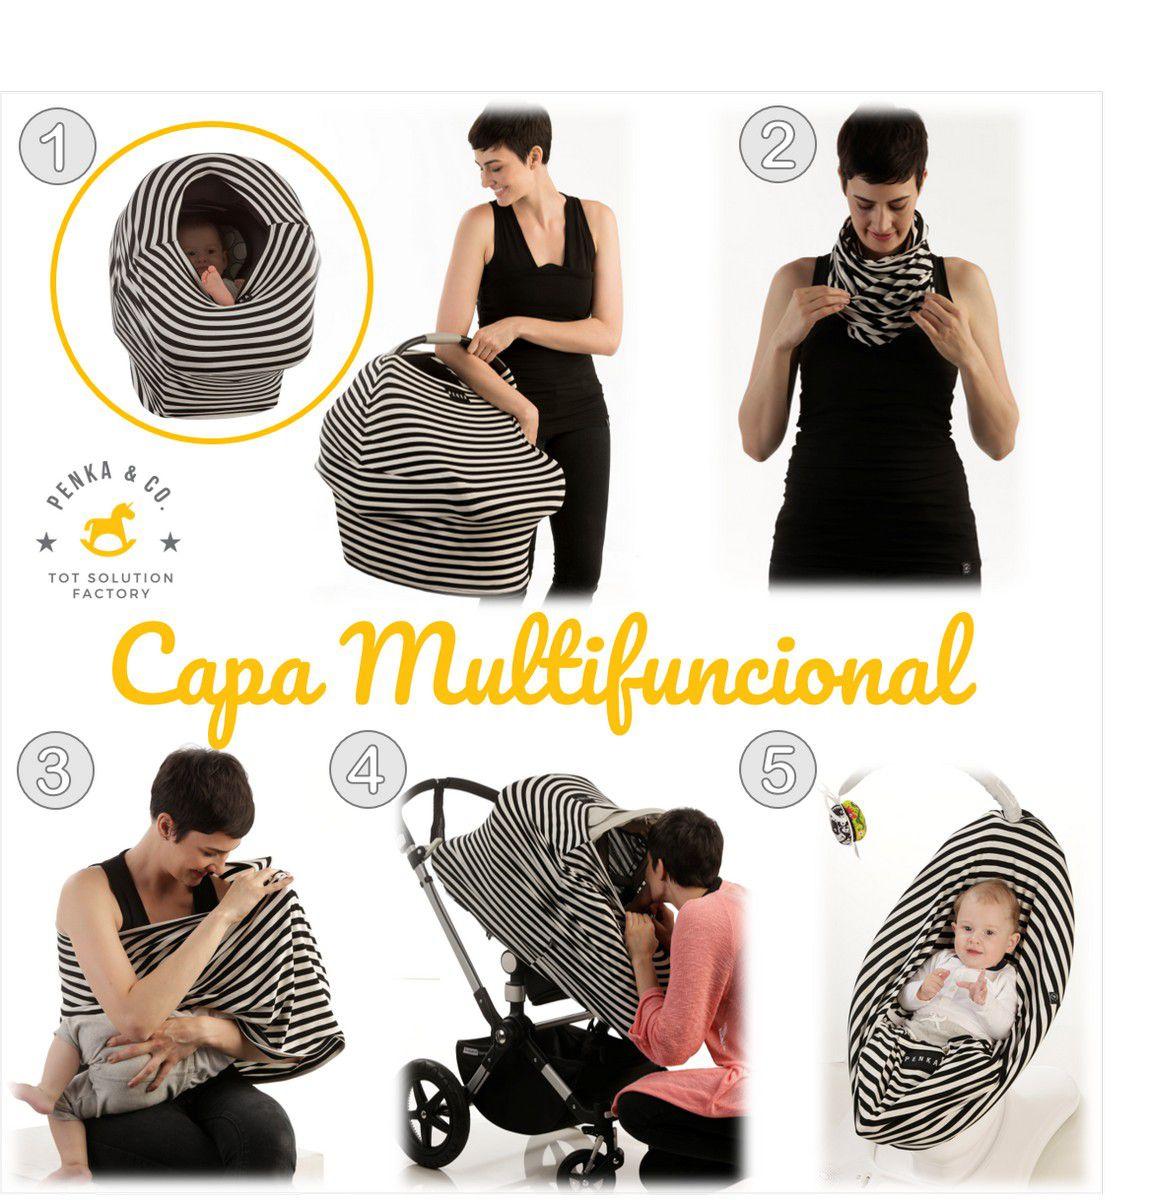 Capa Bebê Conforto Multifuncional Tom Penka